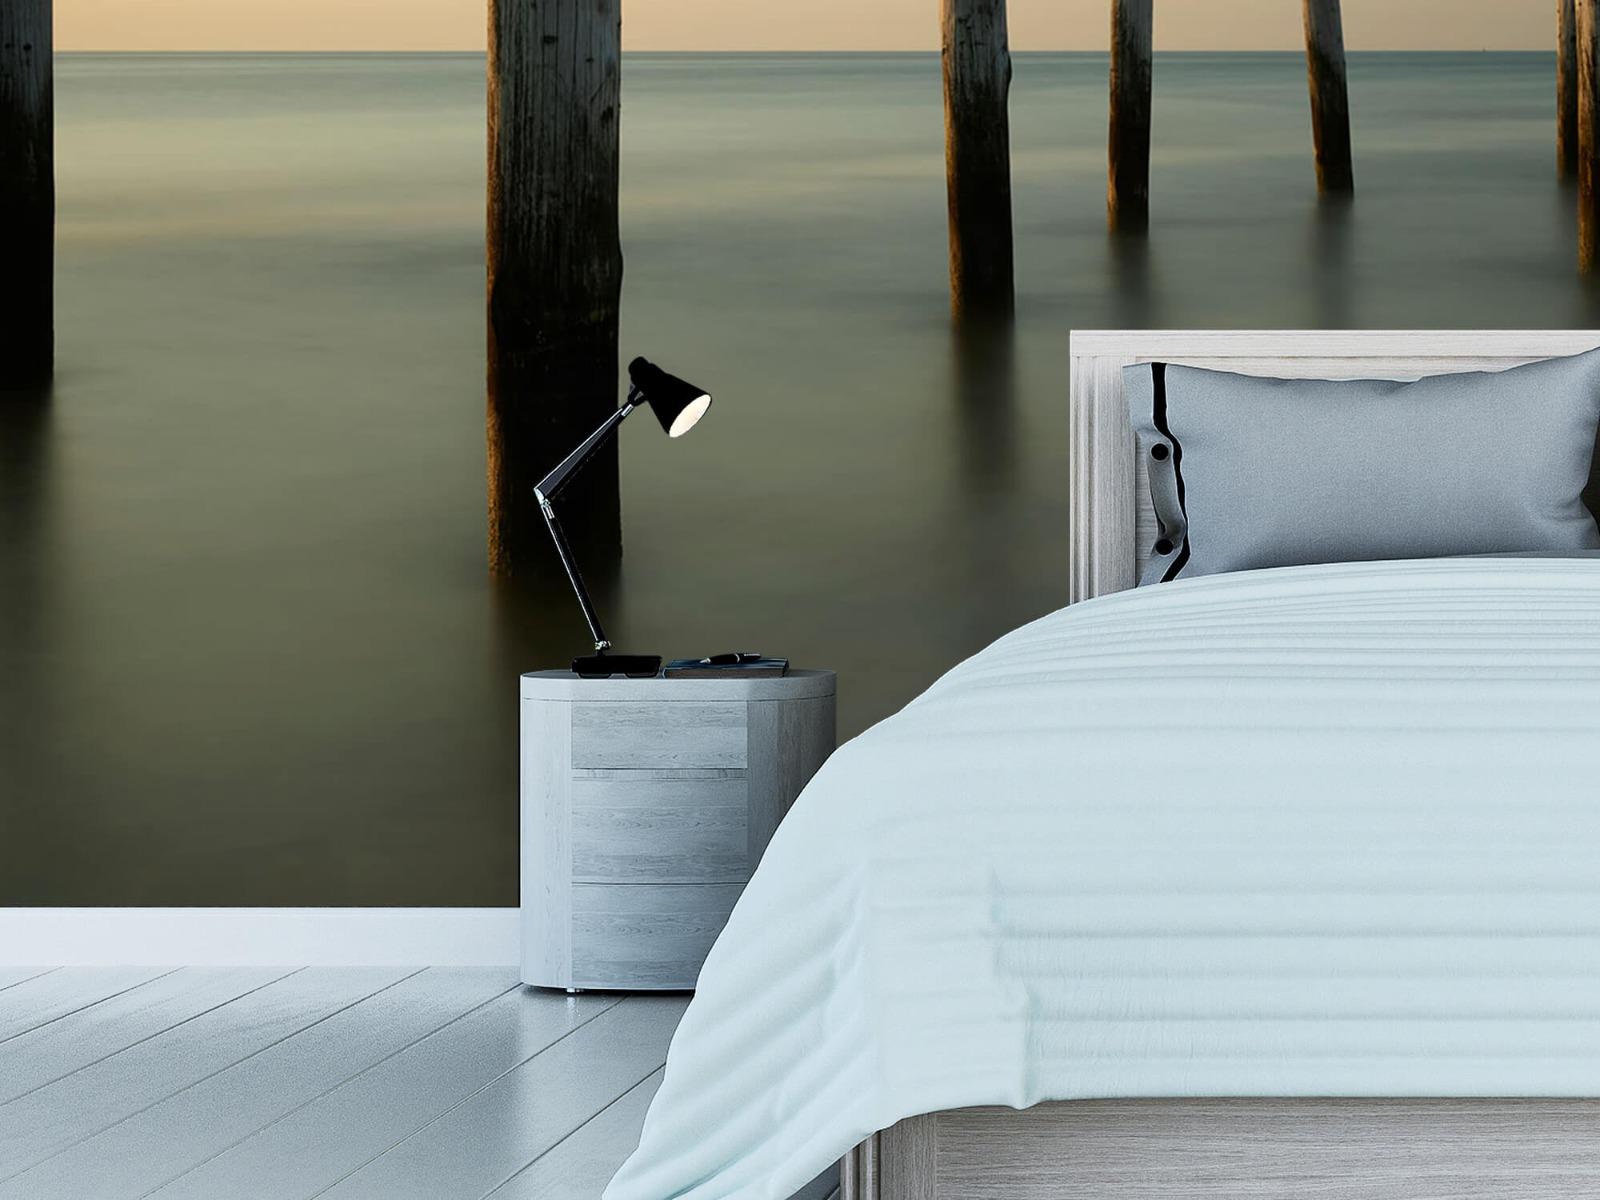 Zeeën en Oceanen - Houten strandpalen - Slaapkamer 15